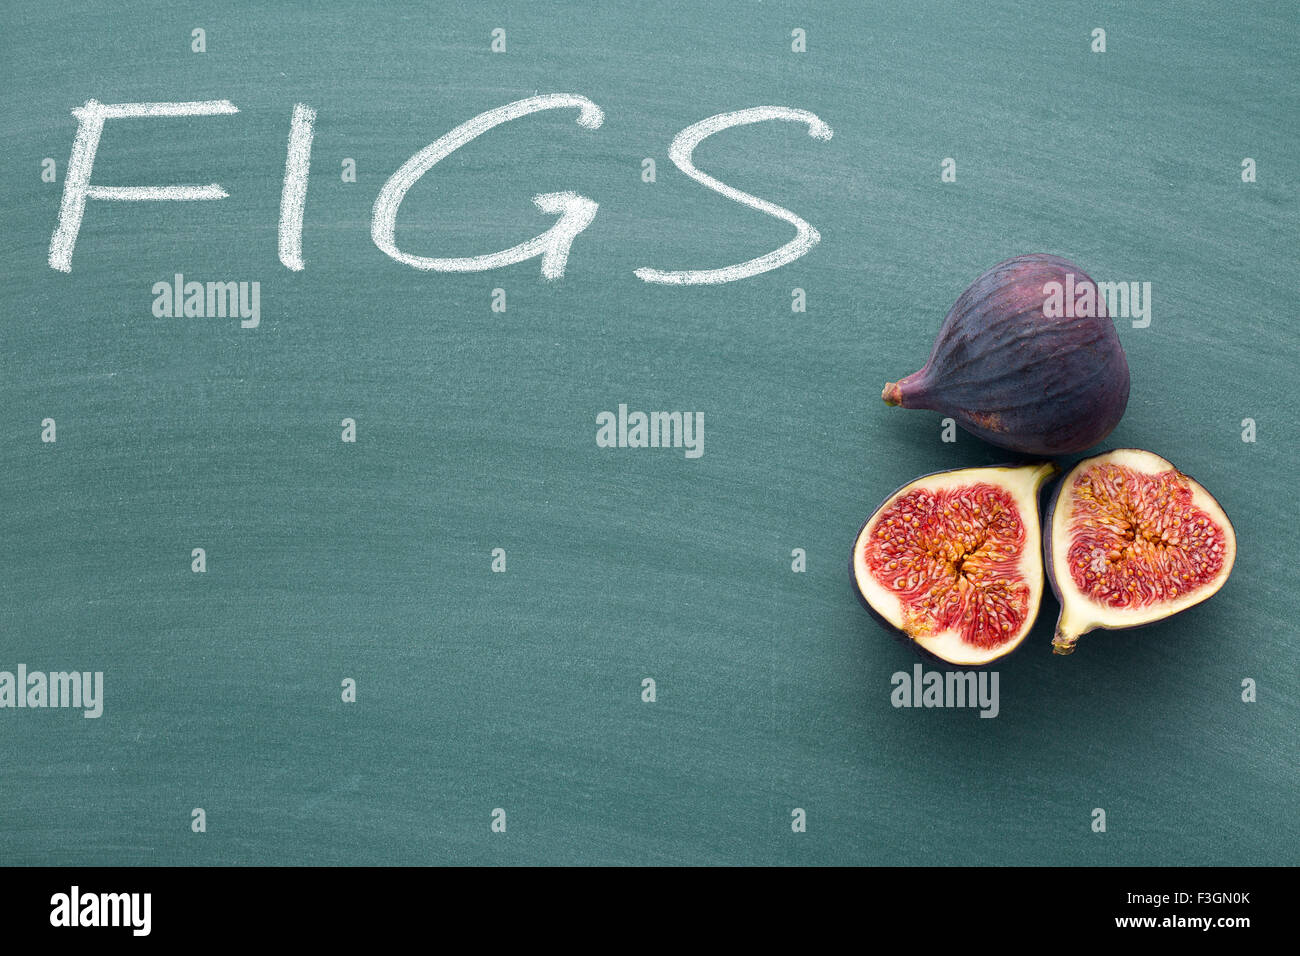 sliced fresh figs on green chalkboard - Stock Image